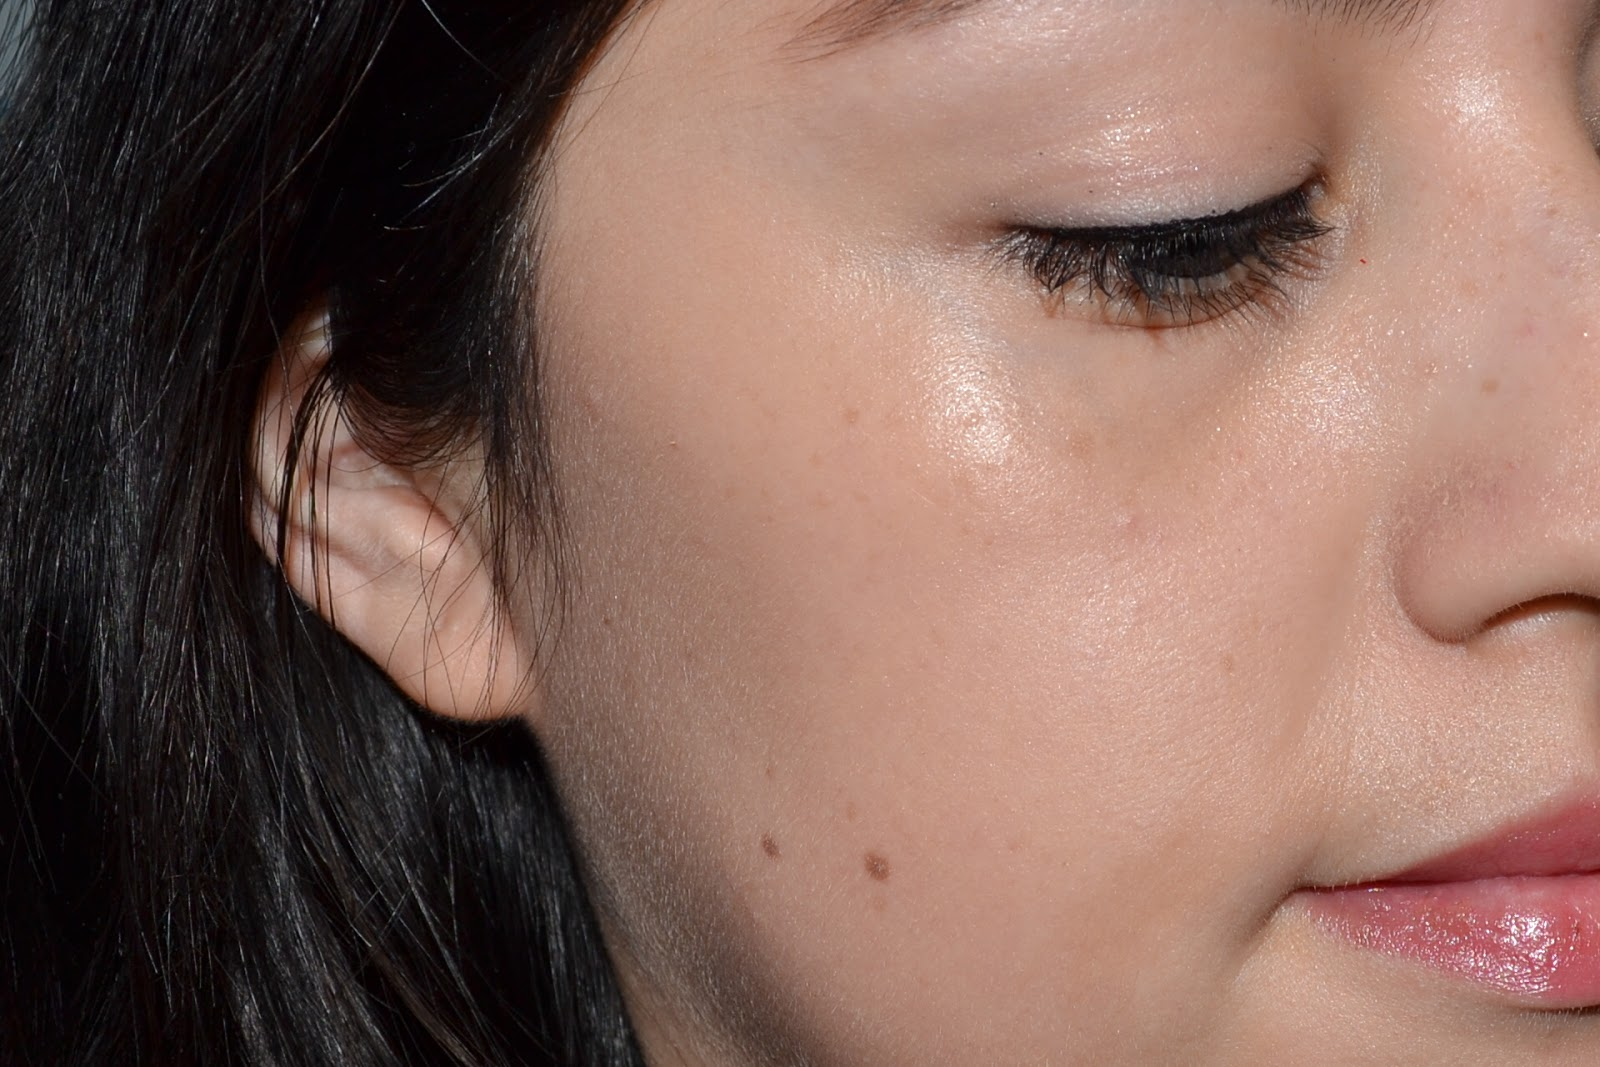 Aquaheart Revlon Photoready Bb Cream Skin Perfector In Lightmedium